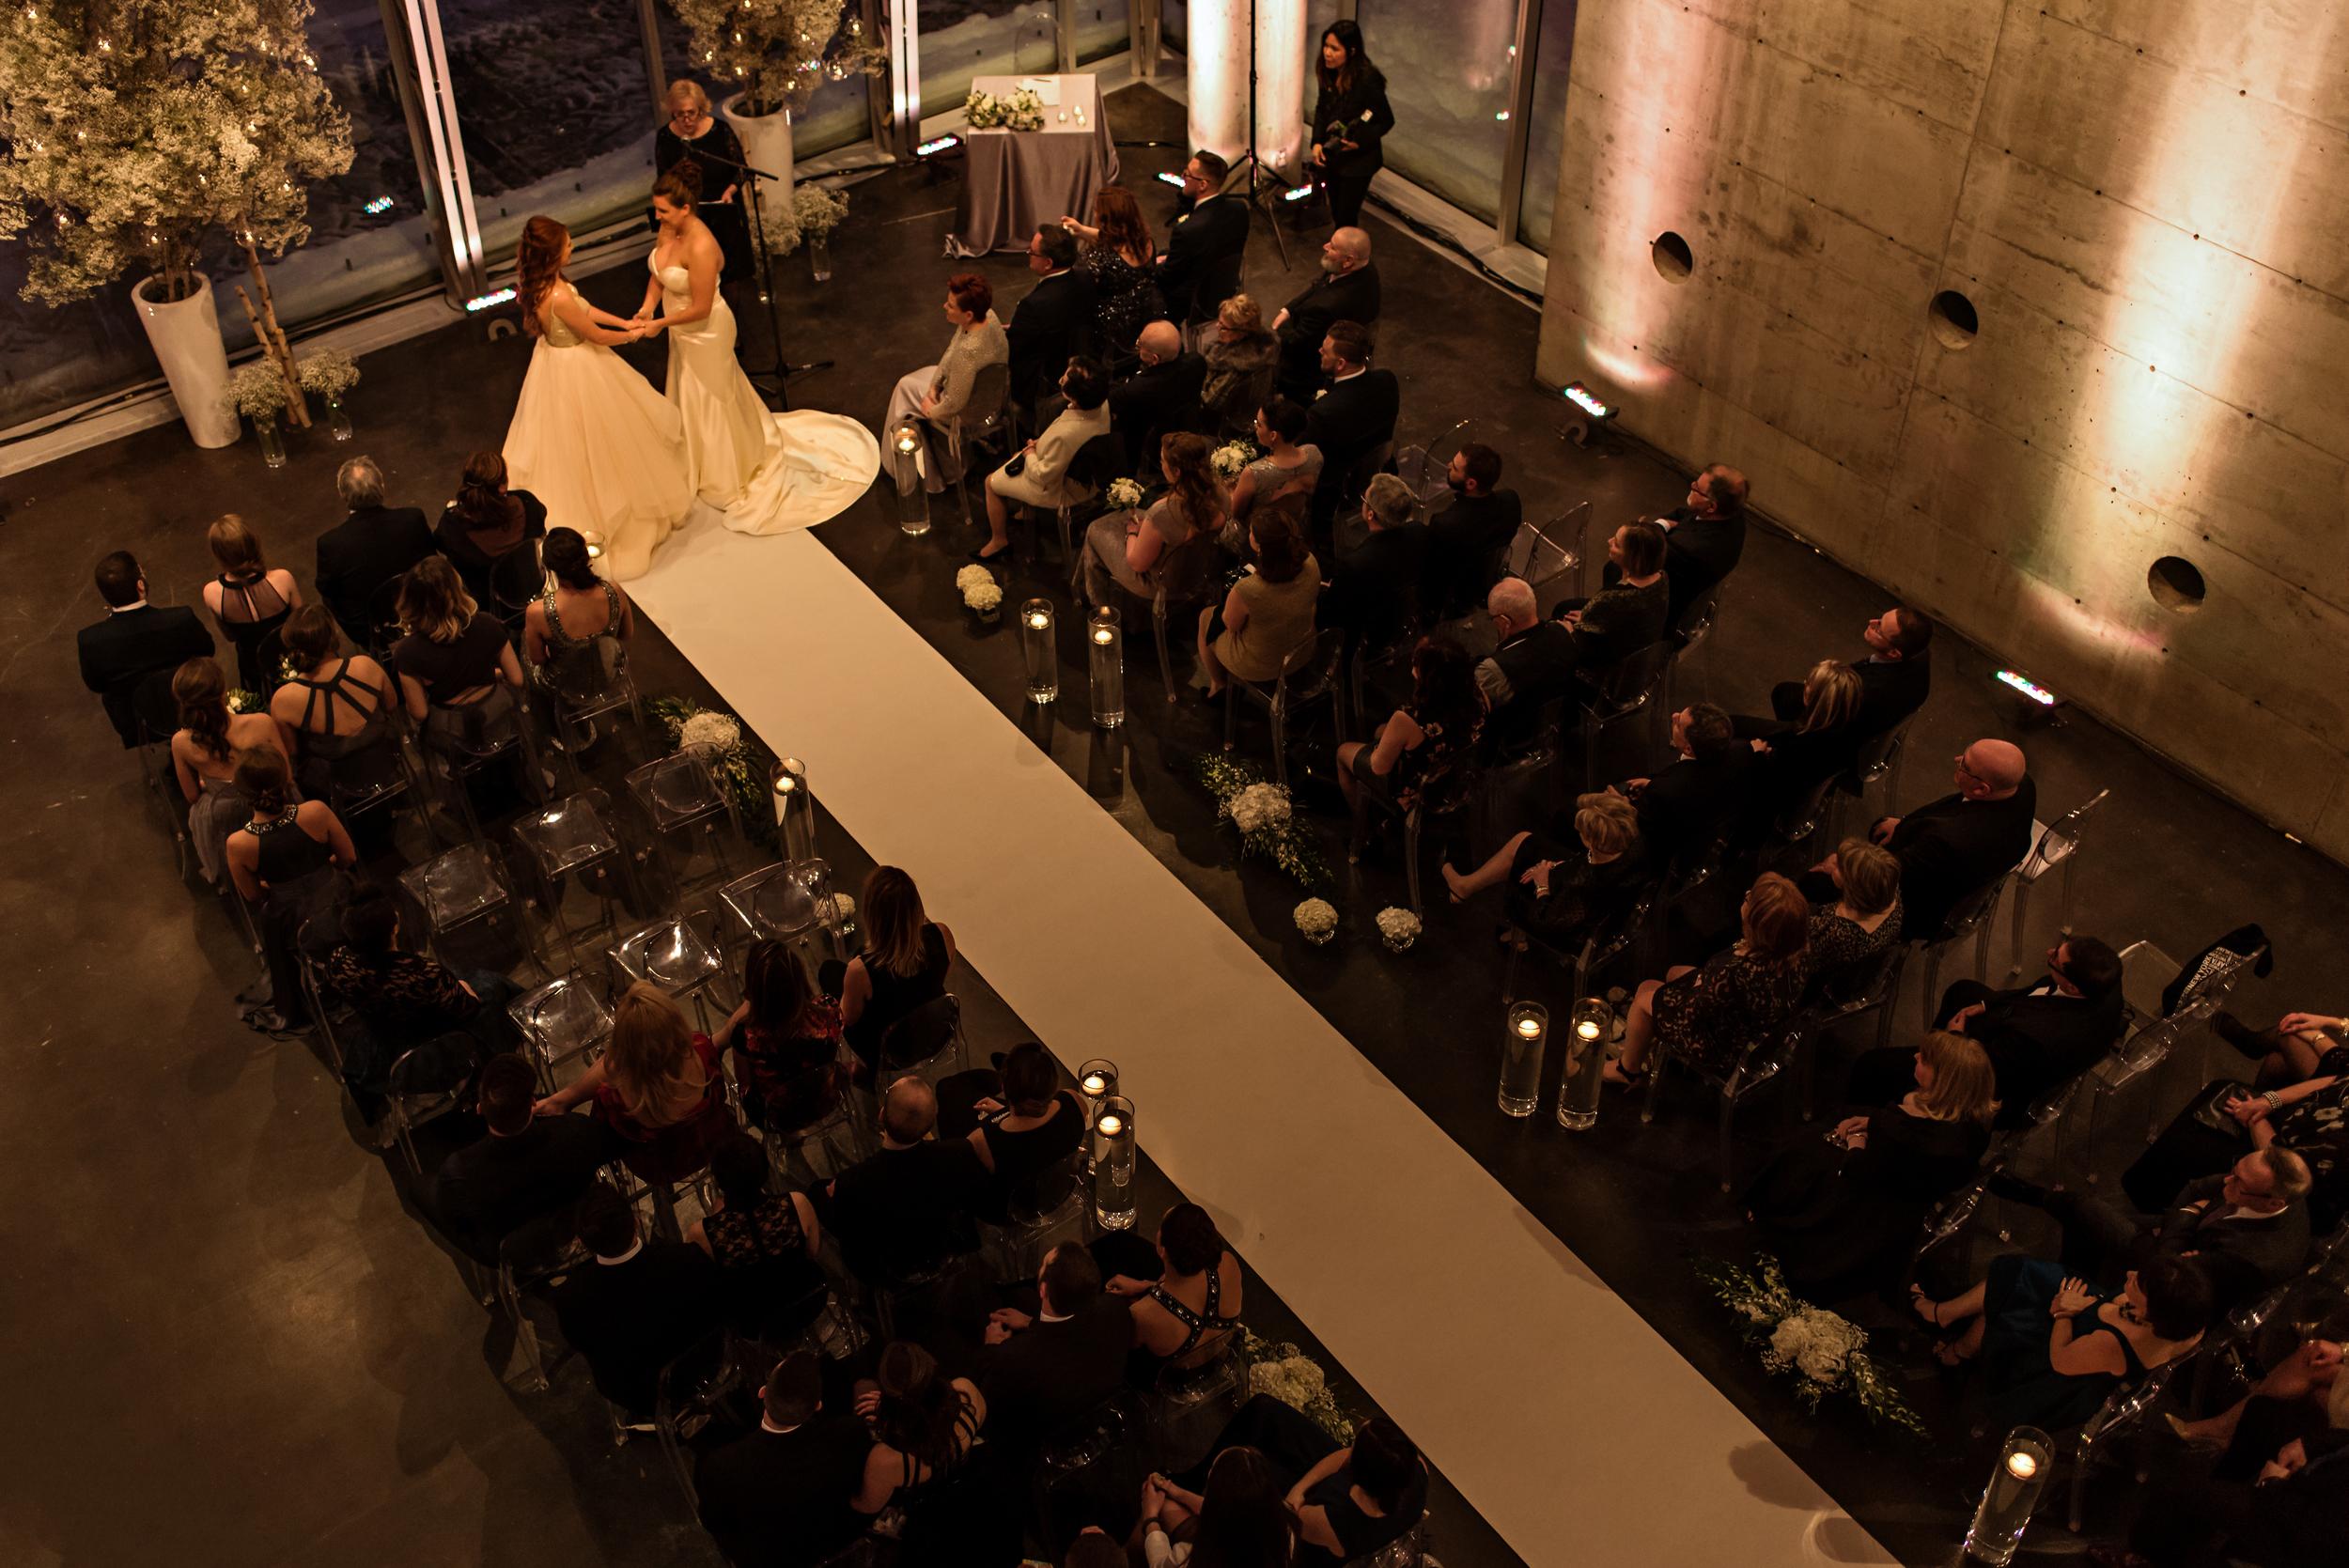 An aerial view of a Quebec City wedding ceremony